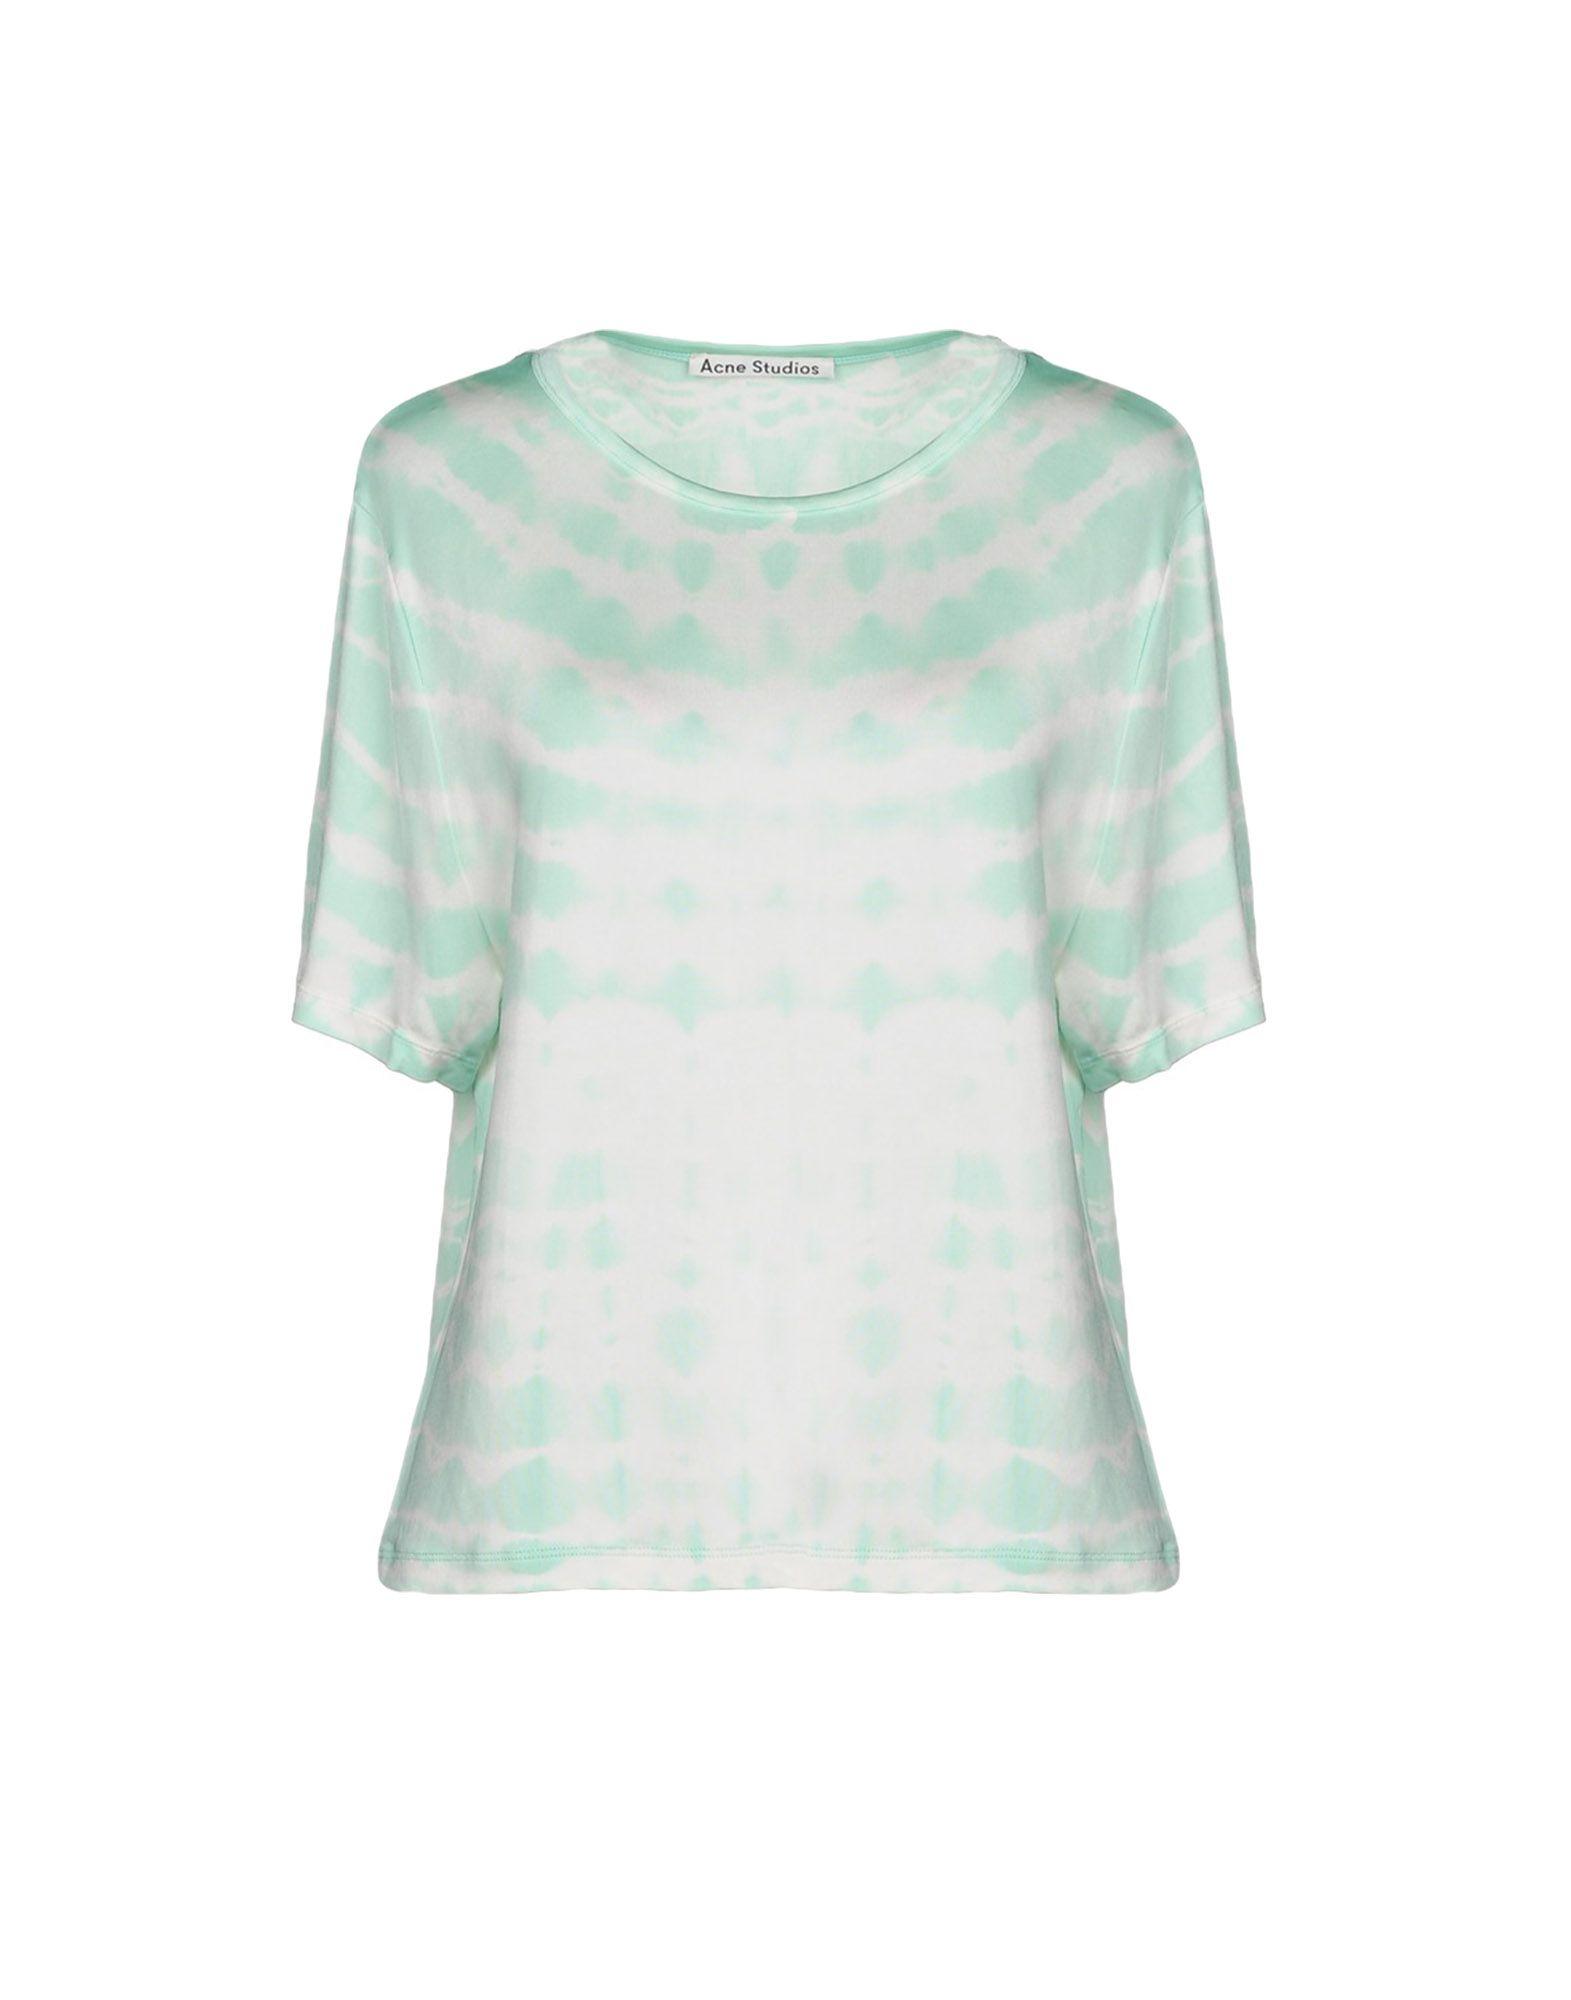 T-Shirt Acne Studios Donna - Acquista online su 2eosq4Bht